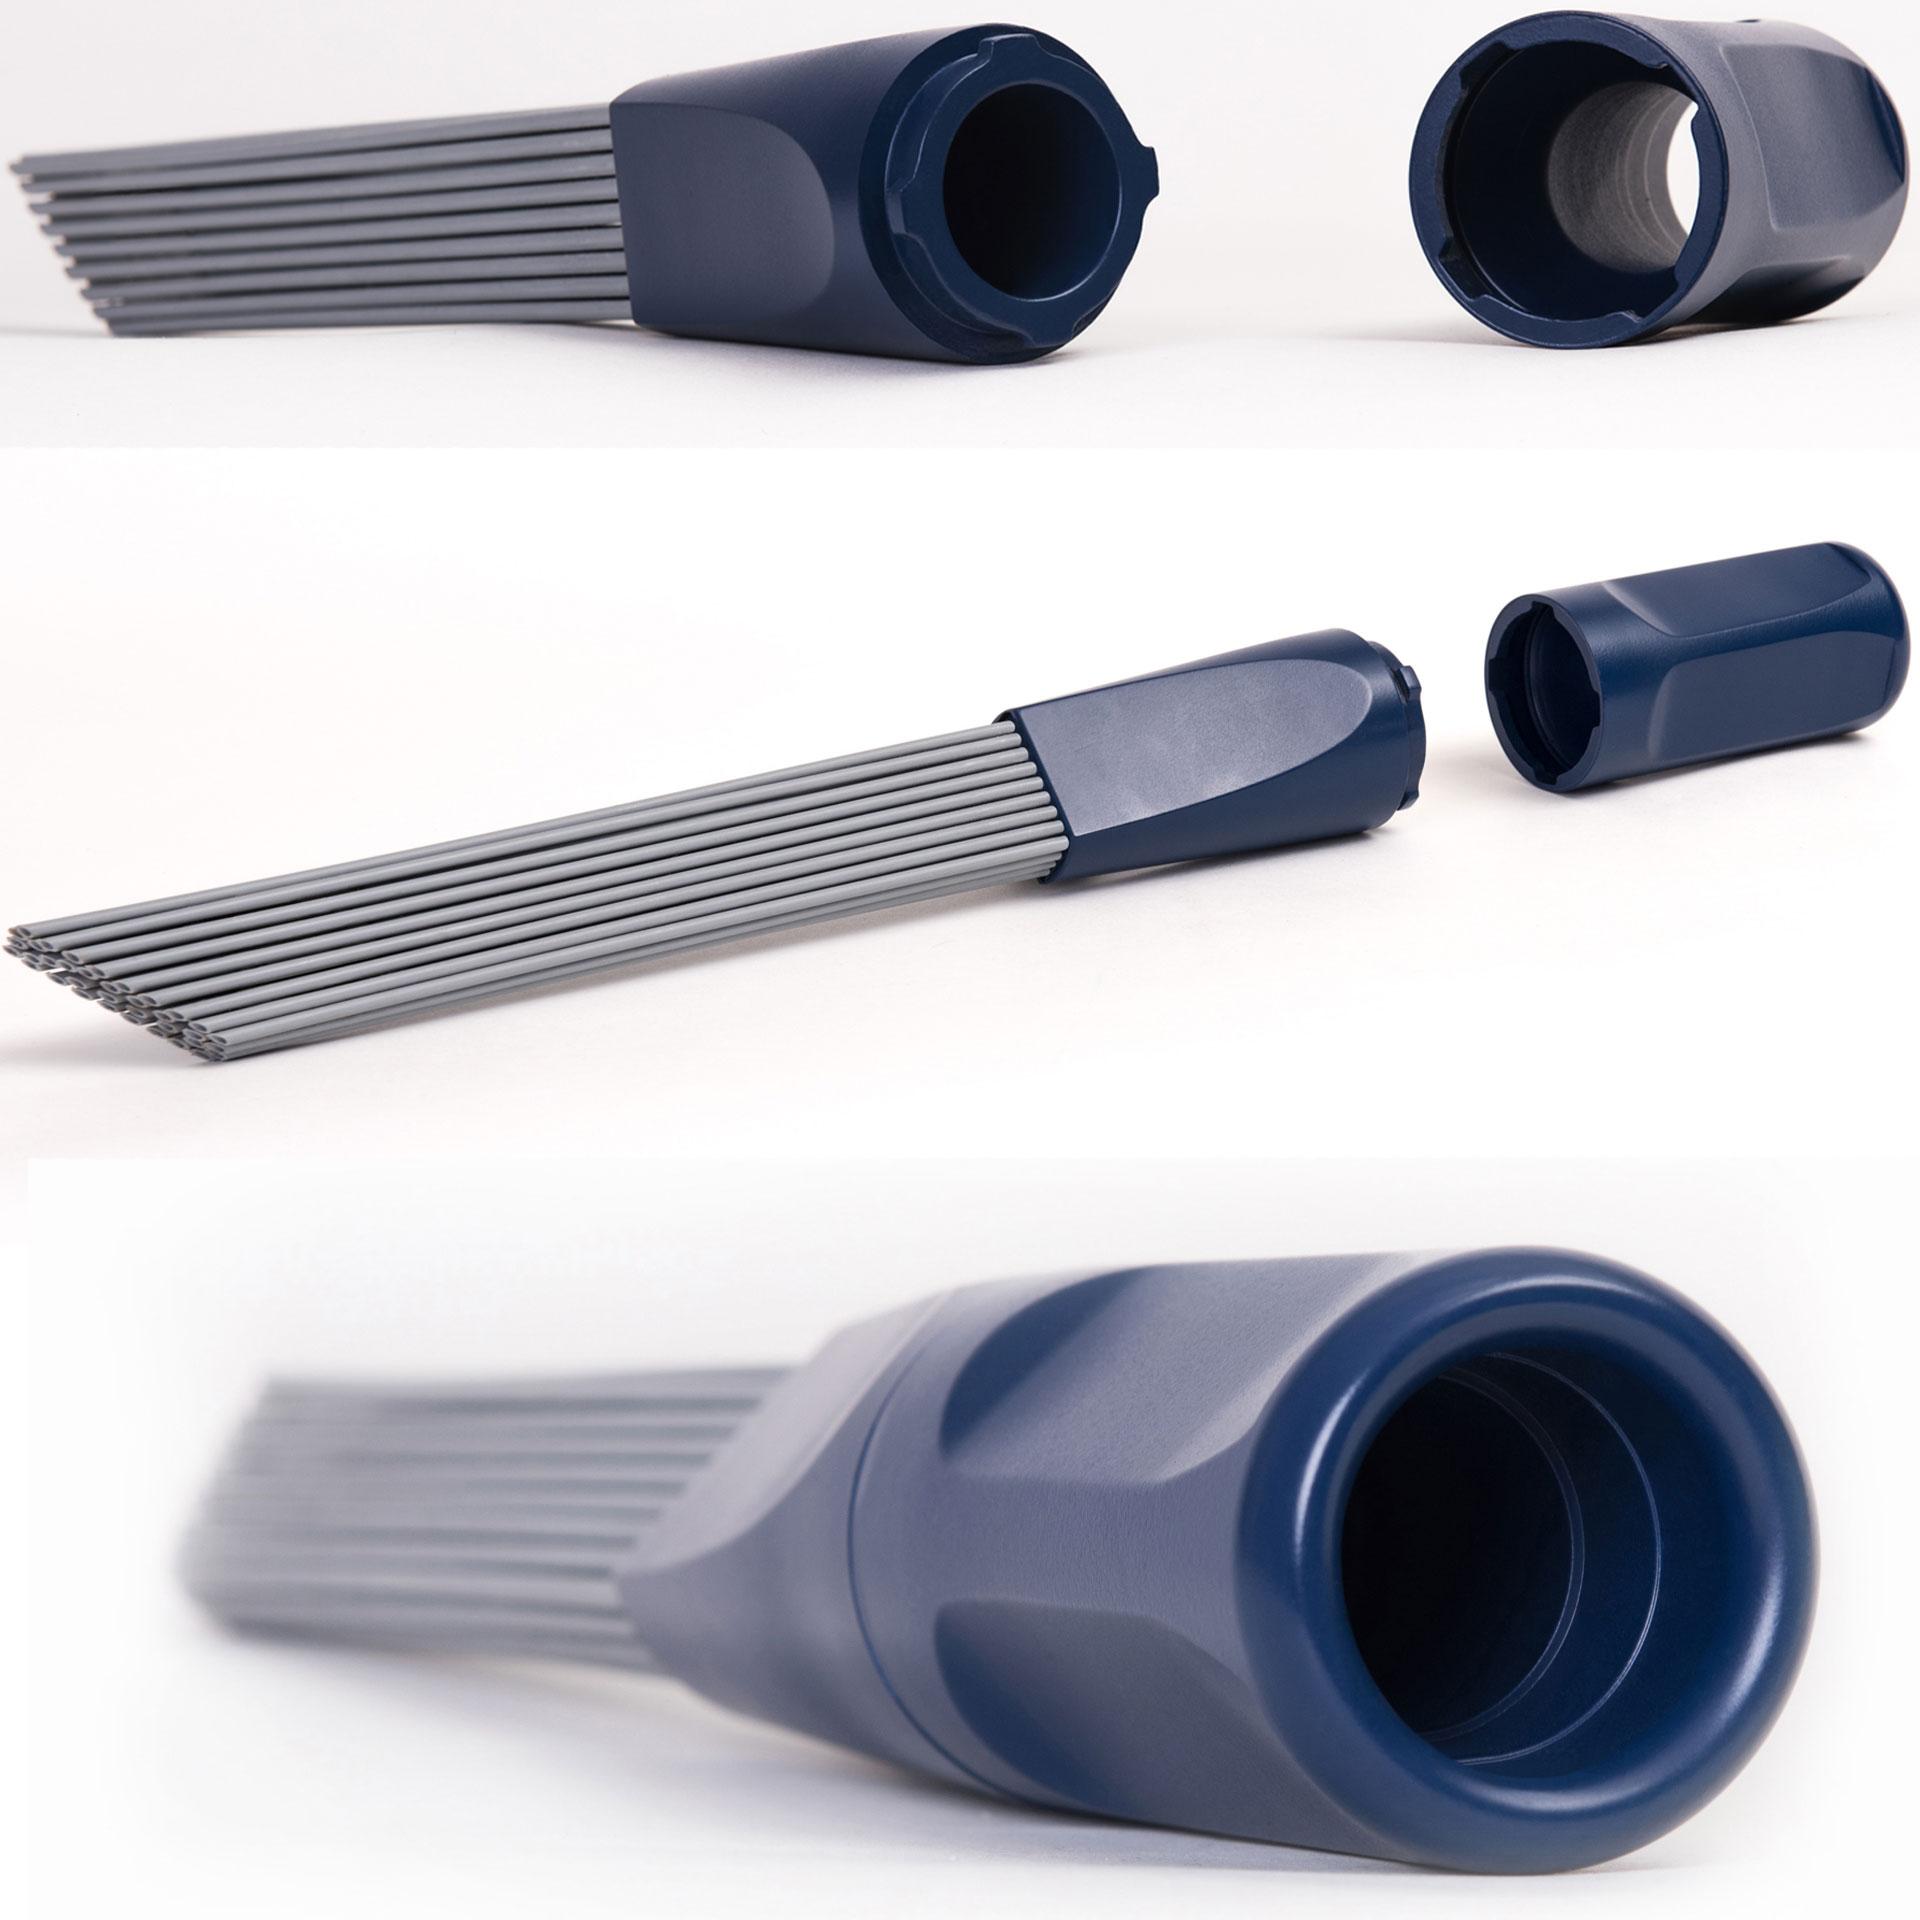 Dusty-Brush Staubsaugeraufsatz Regular - Düse 1,8mm Bild 2